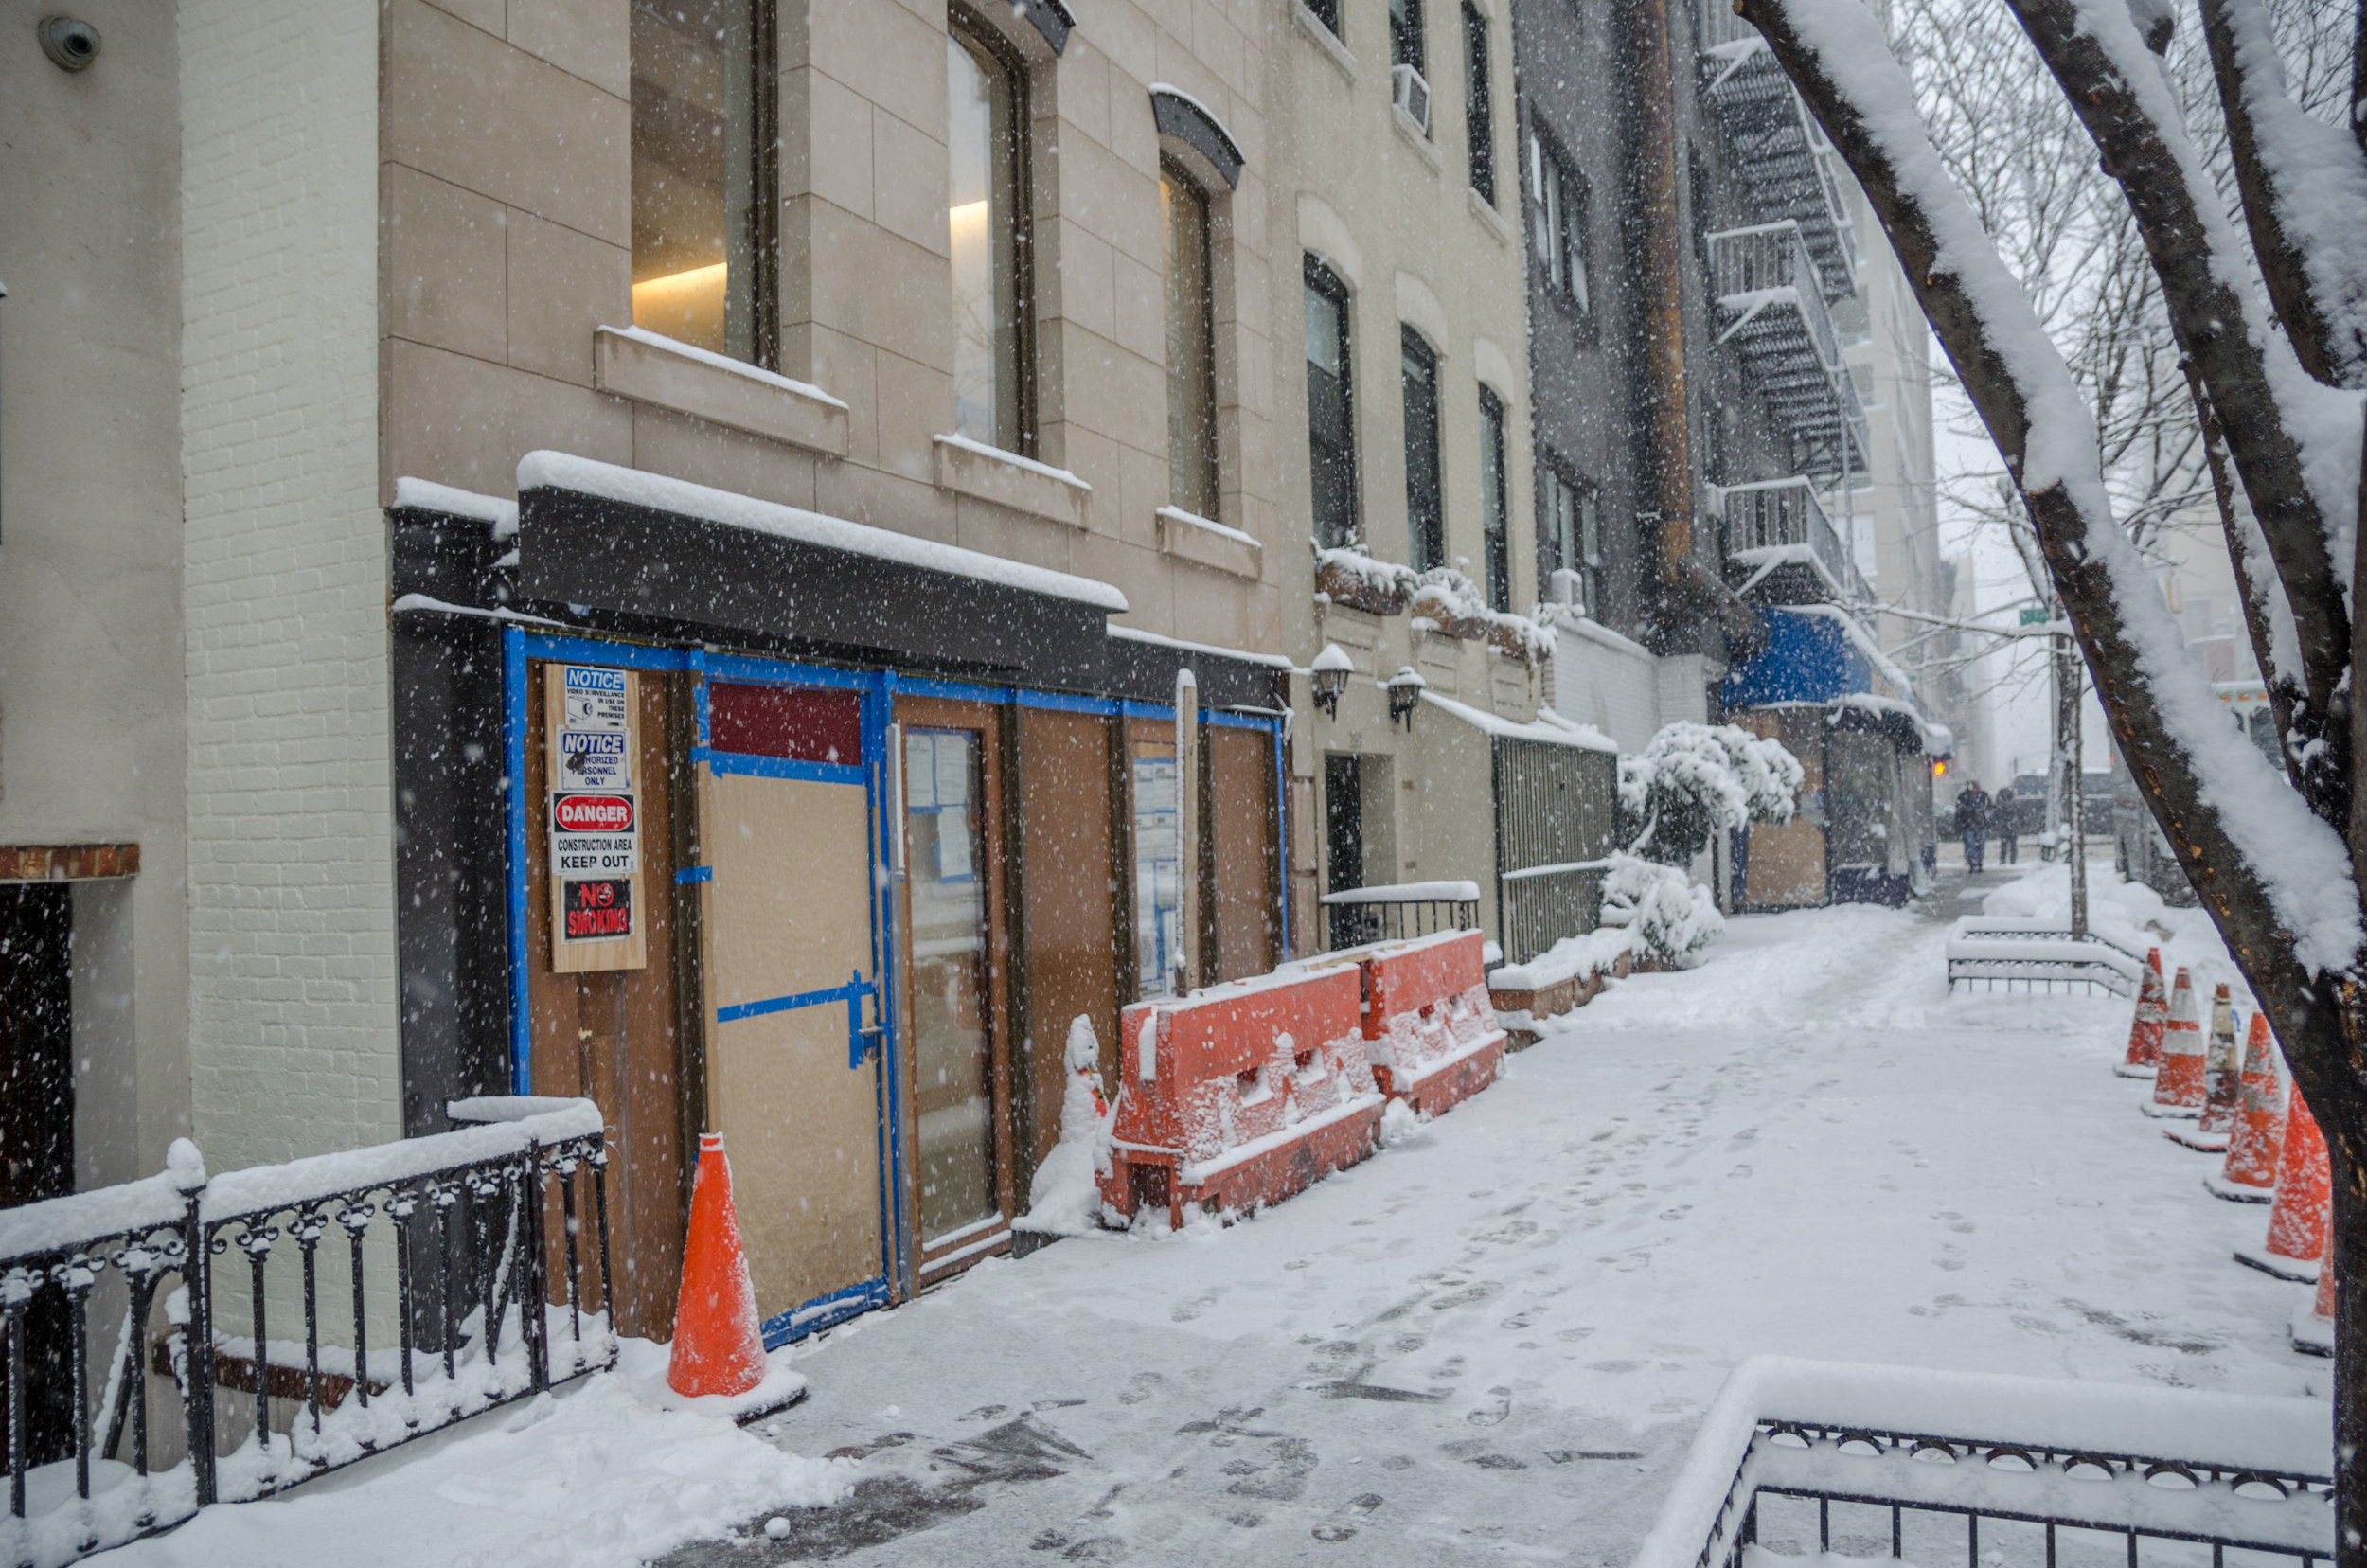 2017-02-09 - Snow Storm-14.jpg